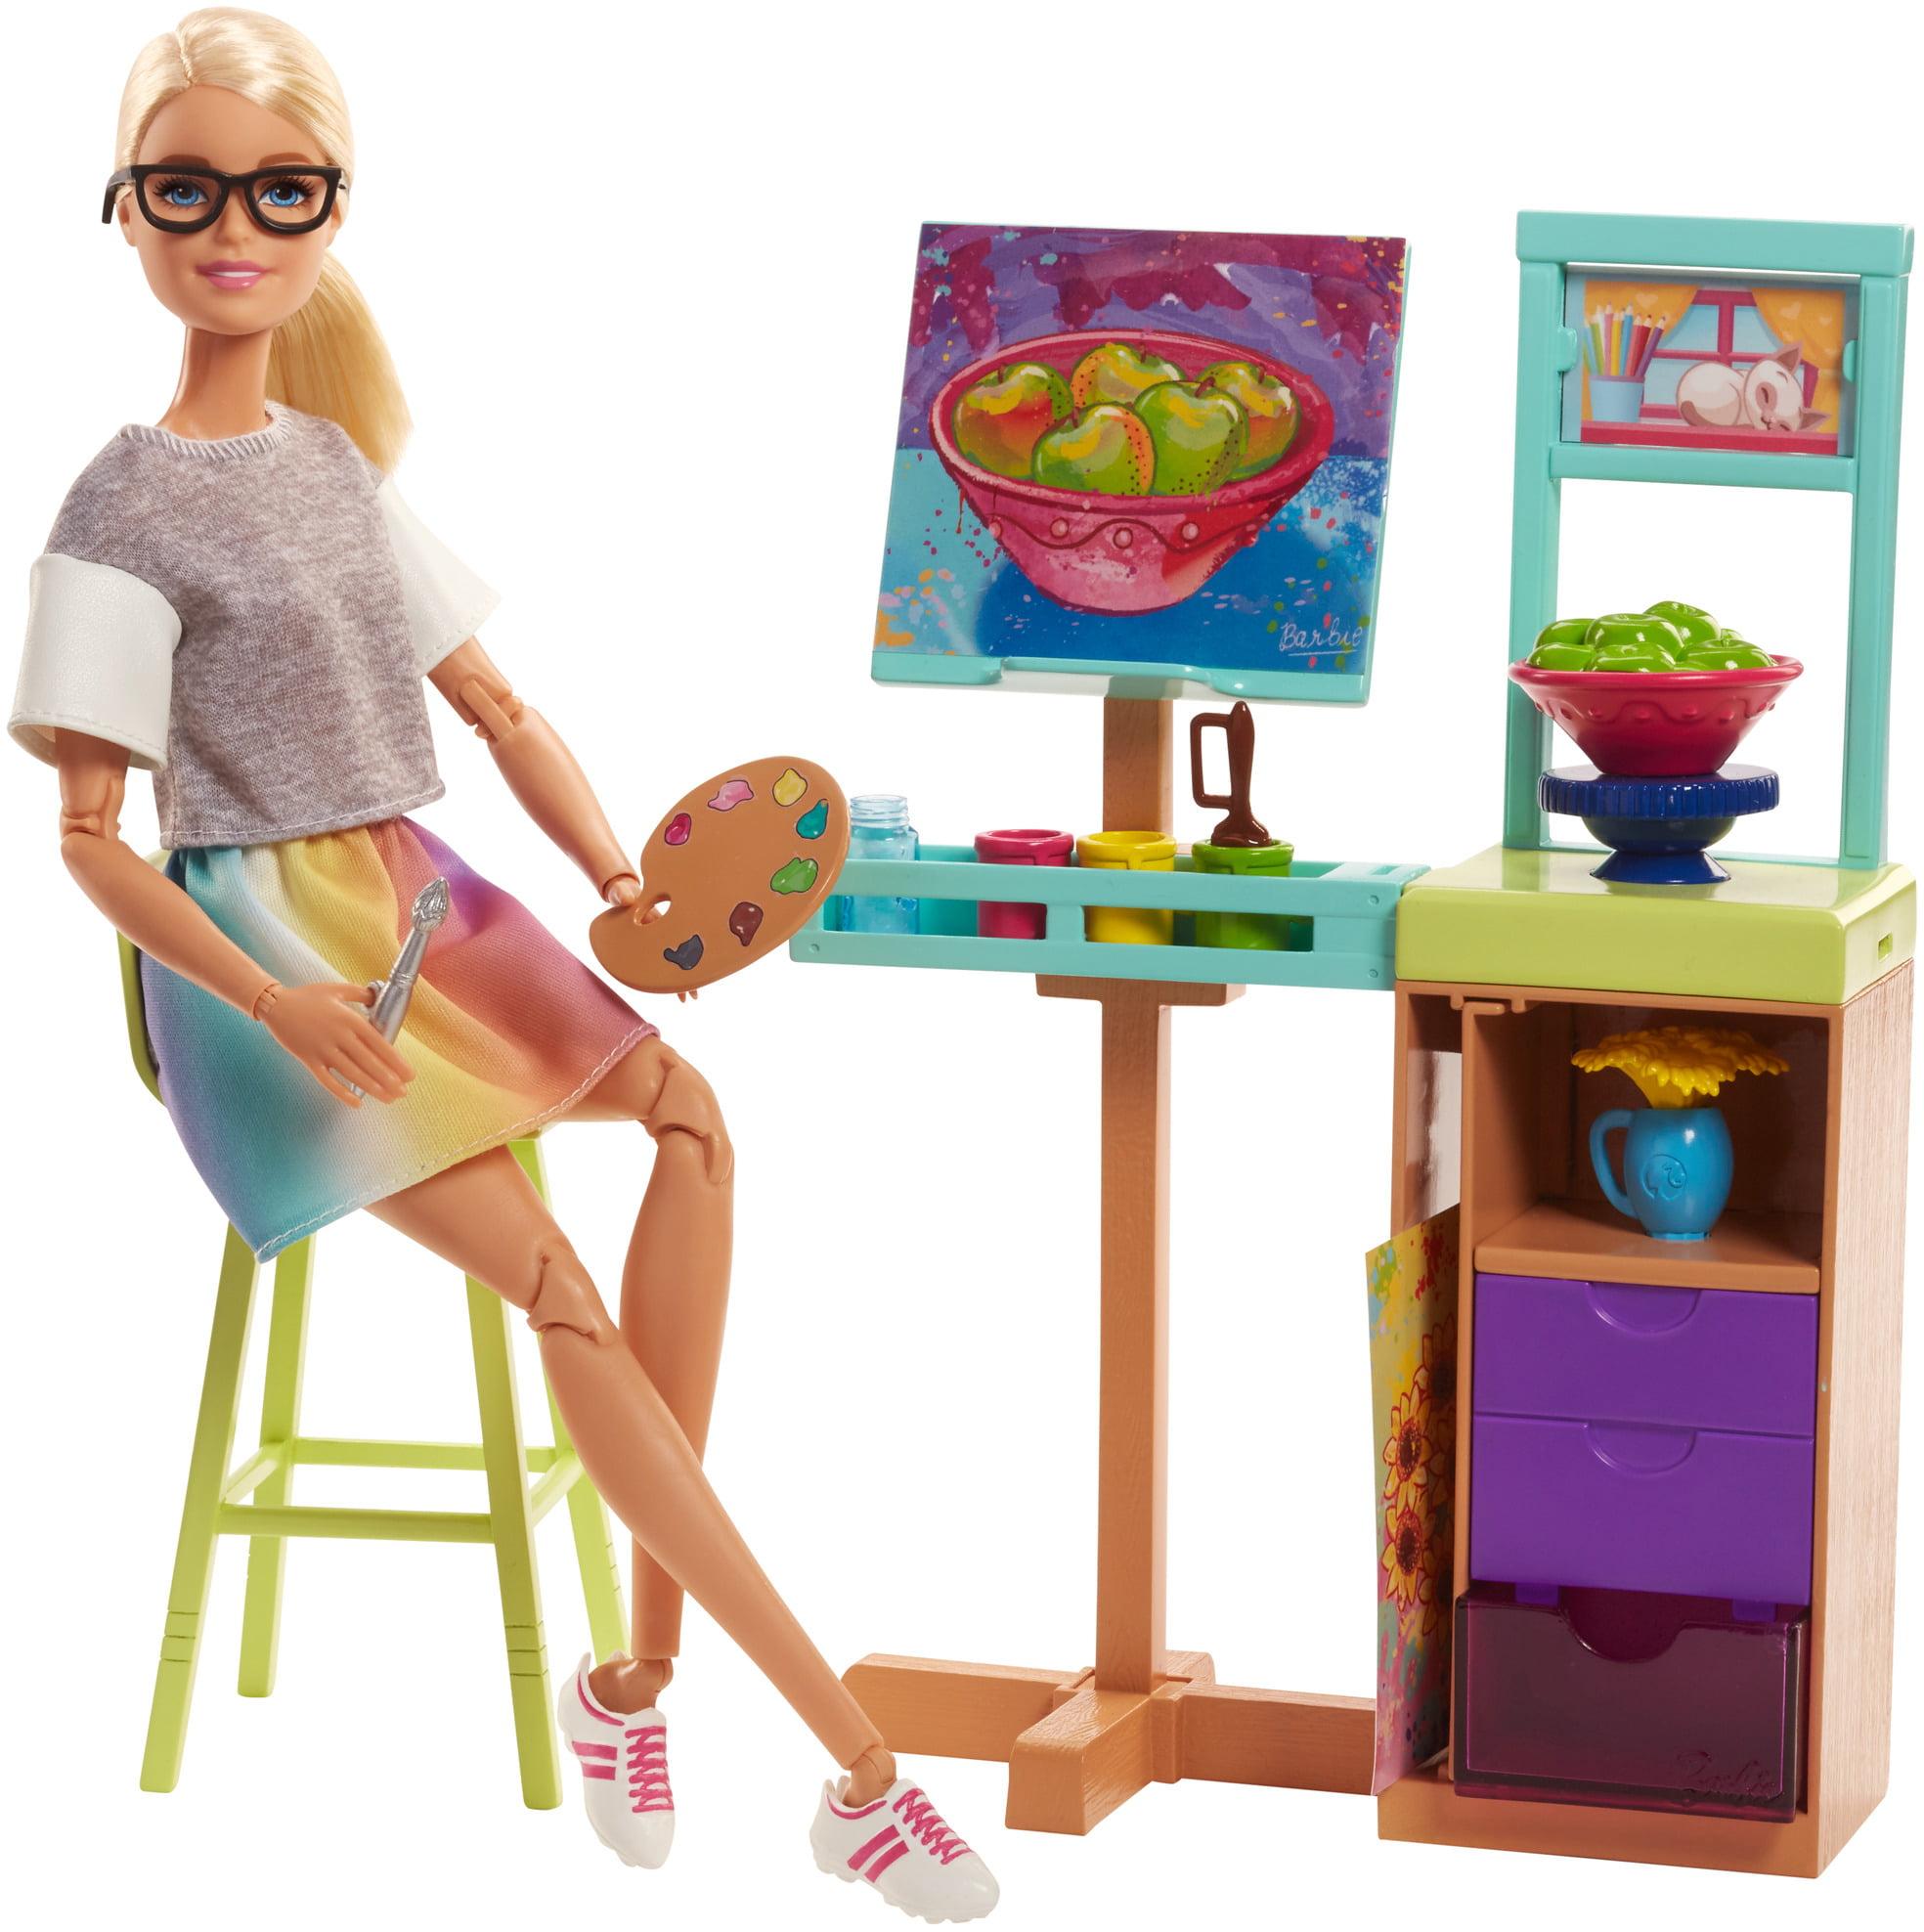 Barbie Careers Art Studio Playset